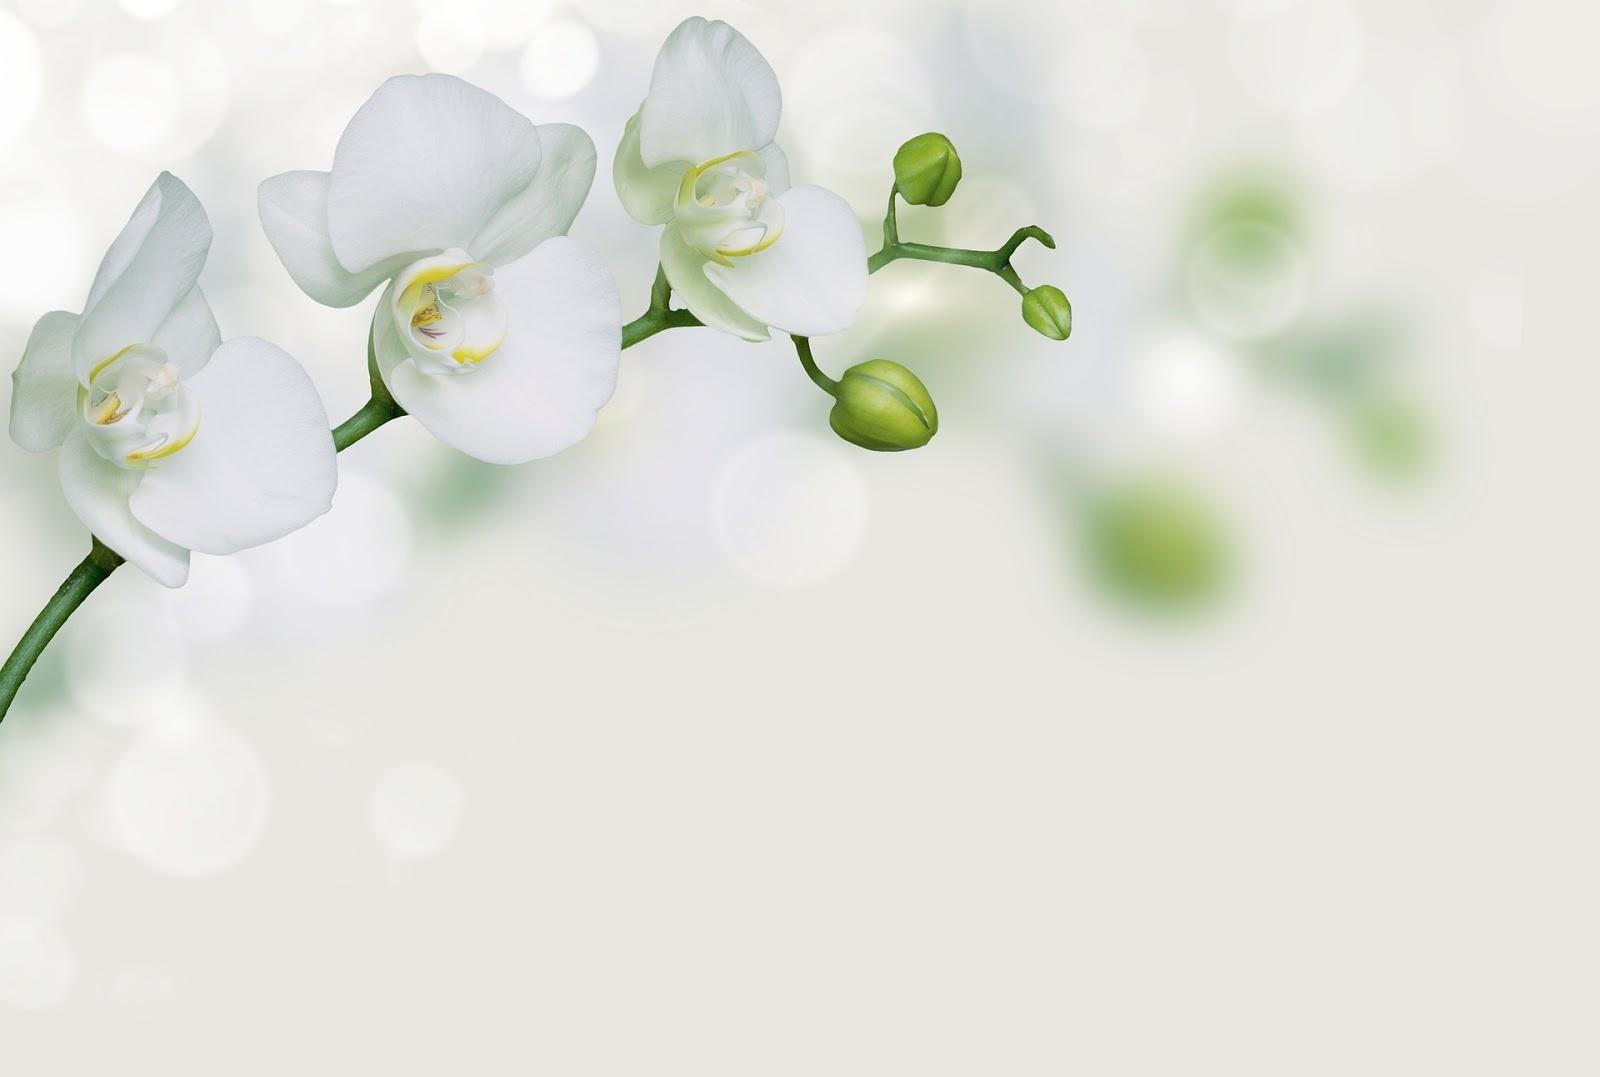 Gambar bunga anggrek bulan